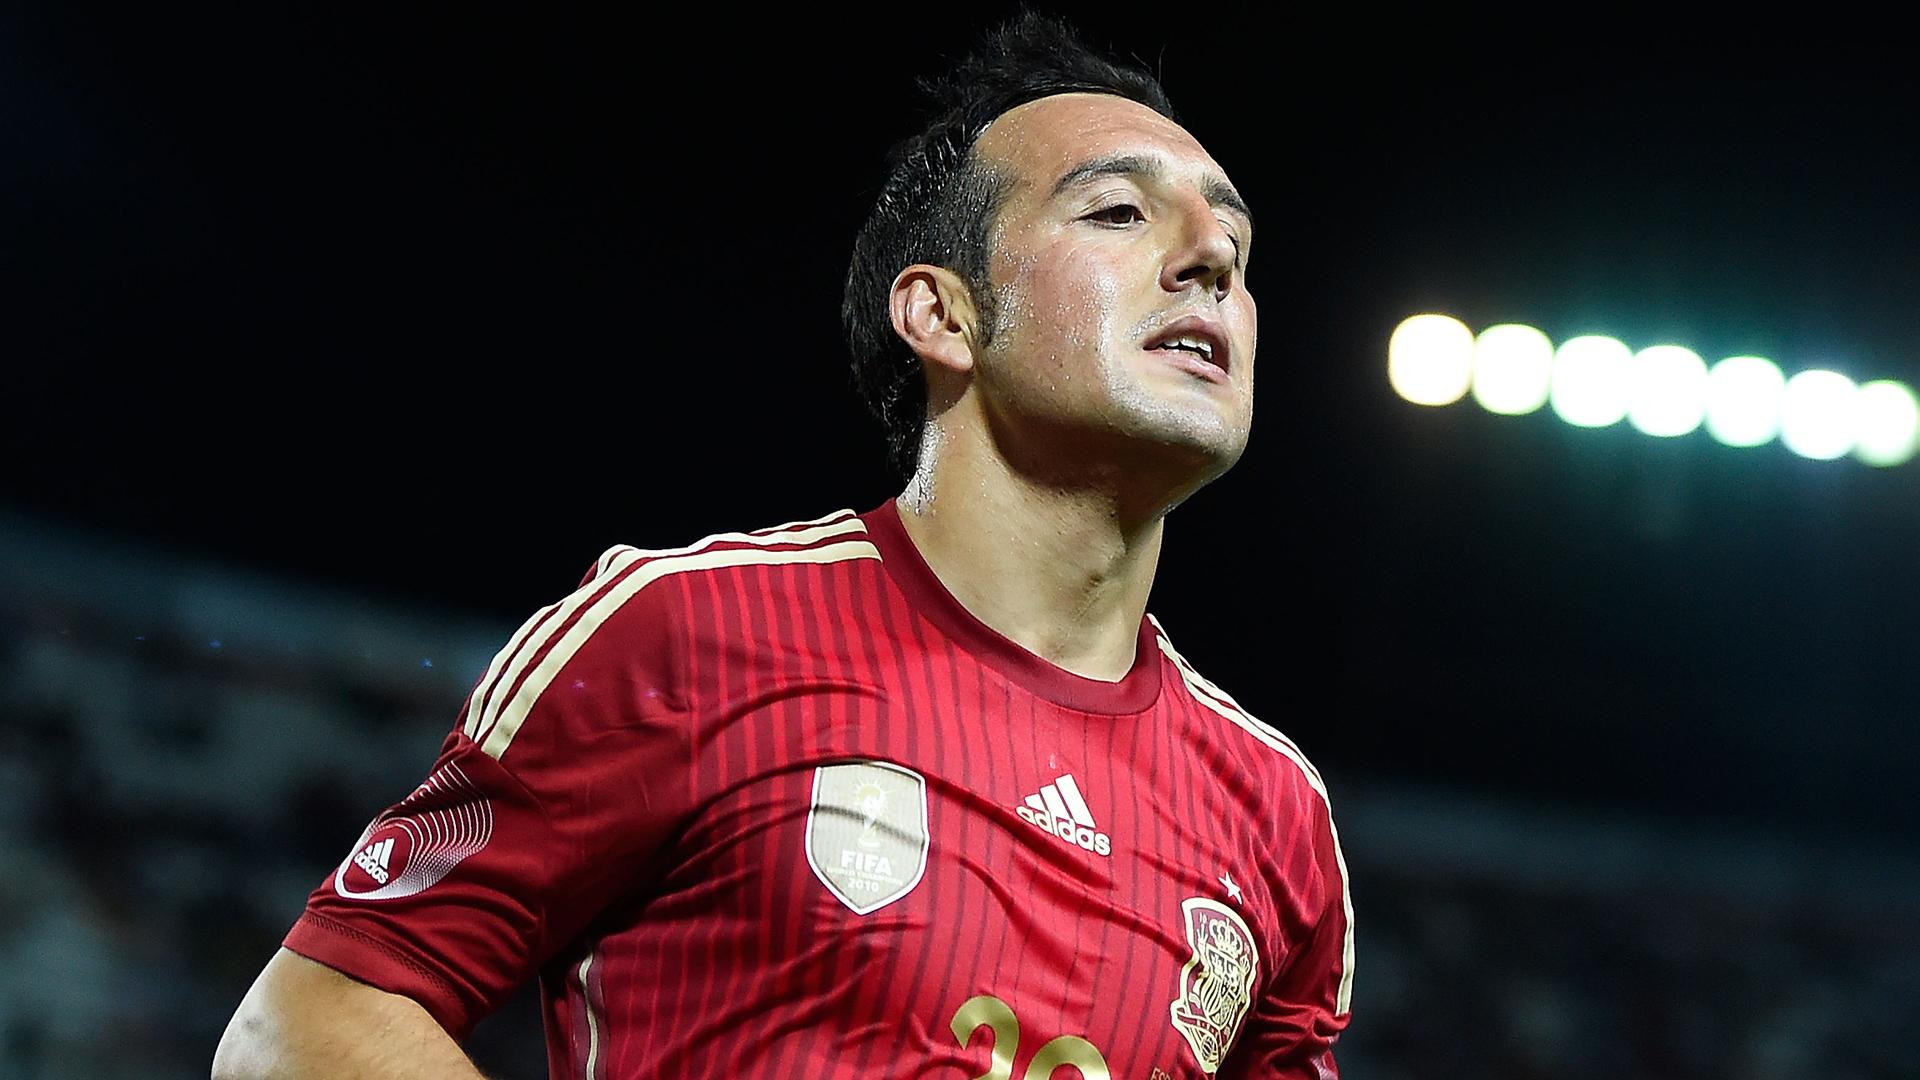 Cazorla earns Spain recall after resurgence at Villarreal